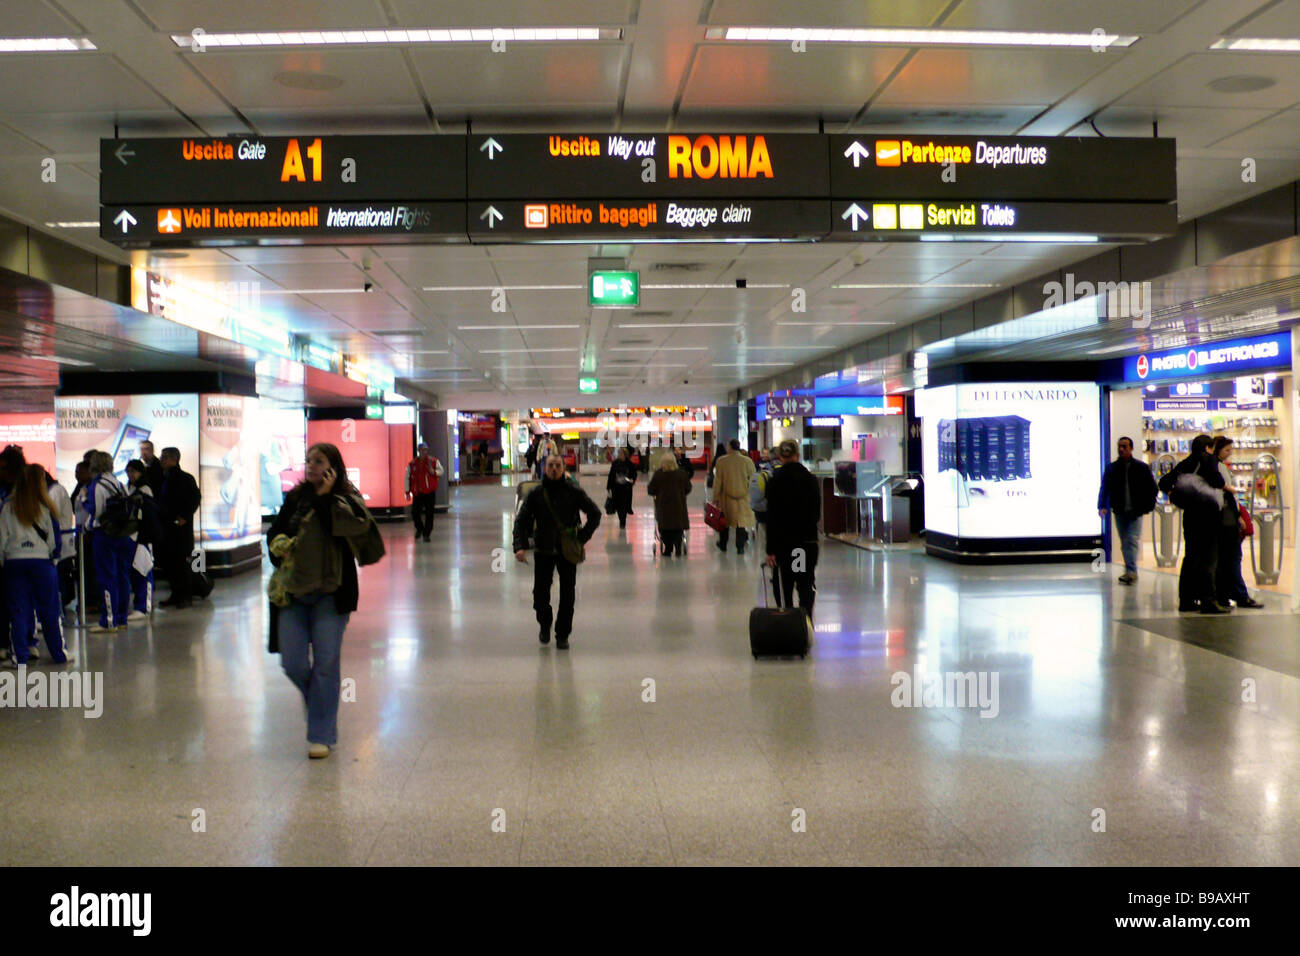 Airport Rome Fiumicino - Stock Image